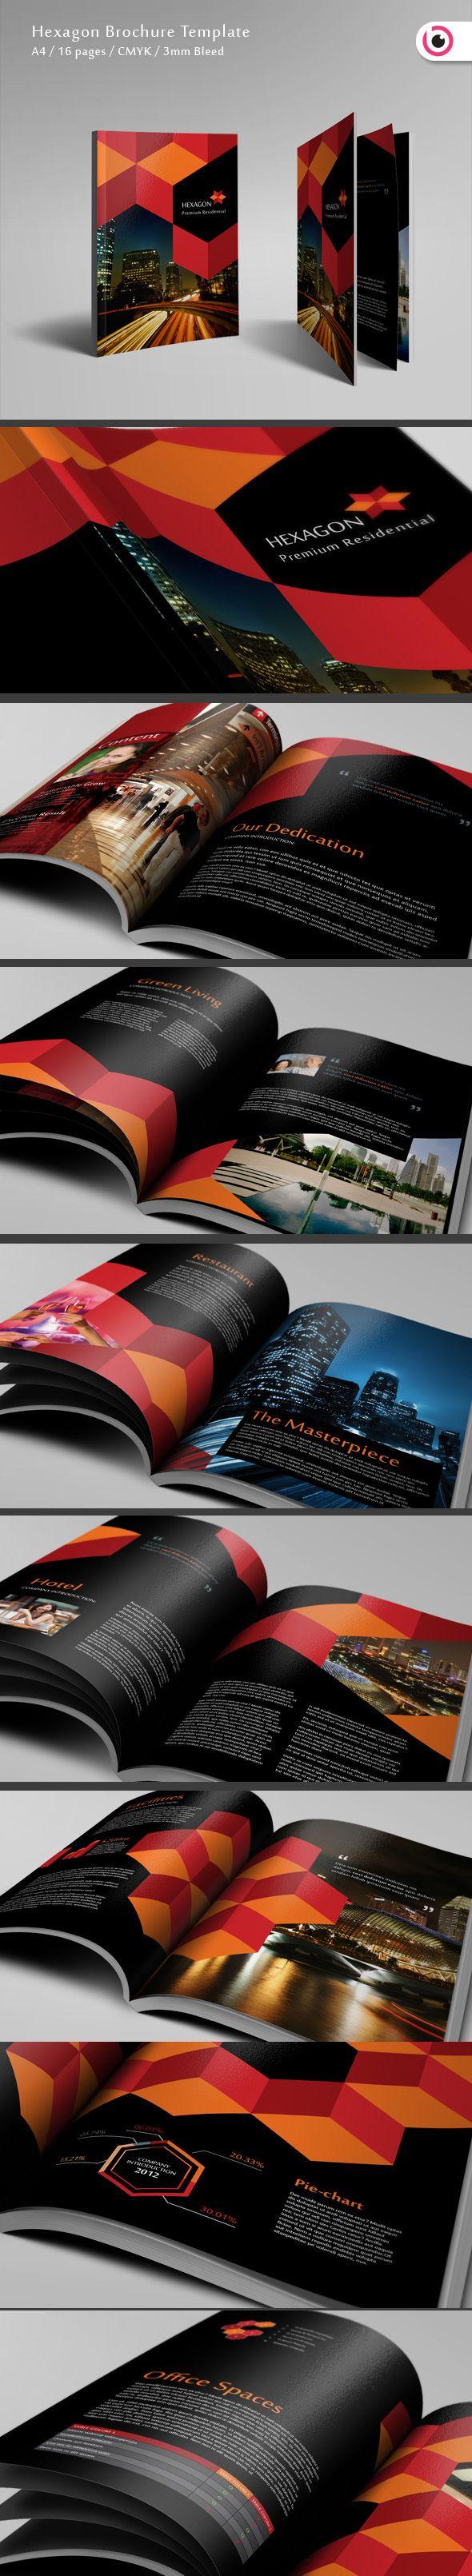 Hexagon Brochure Template by Tony Huynh, via Behance